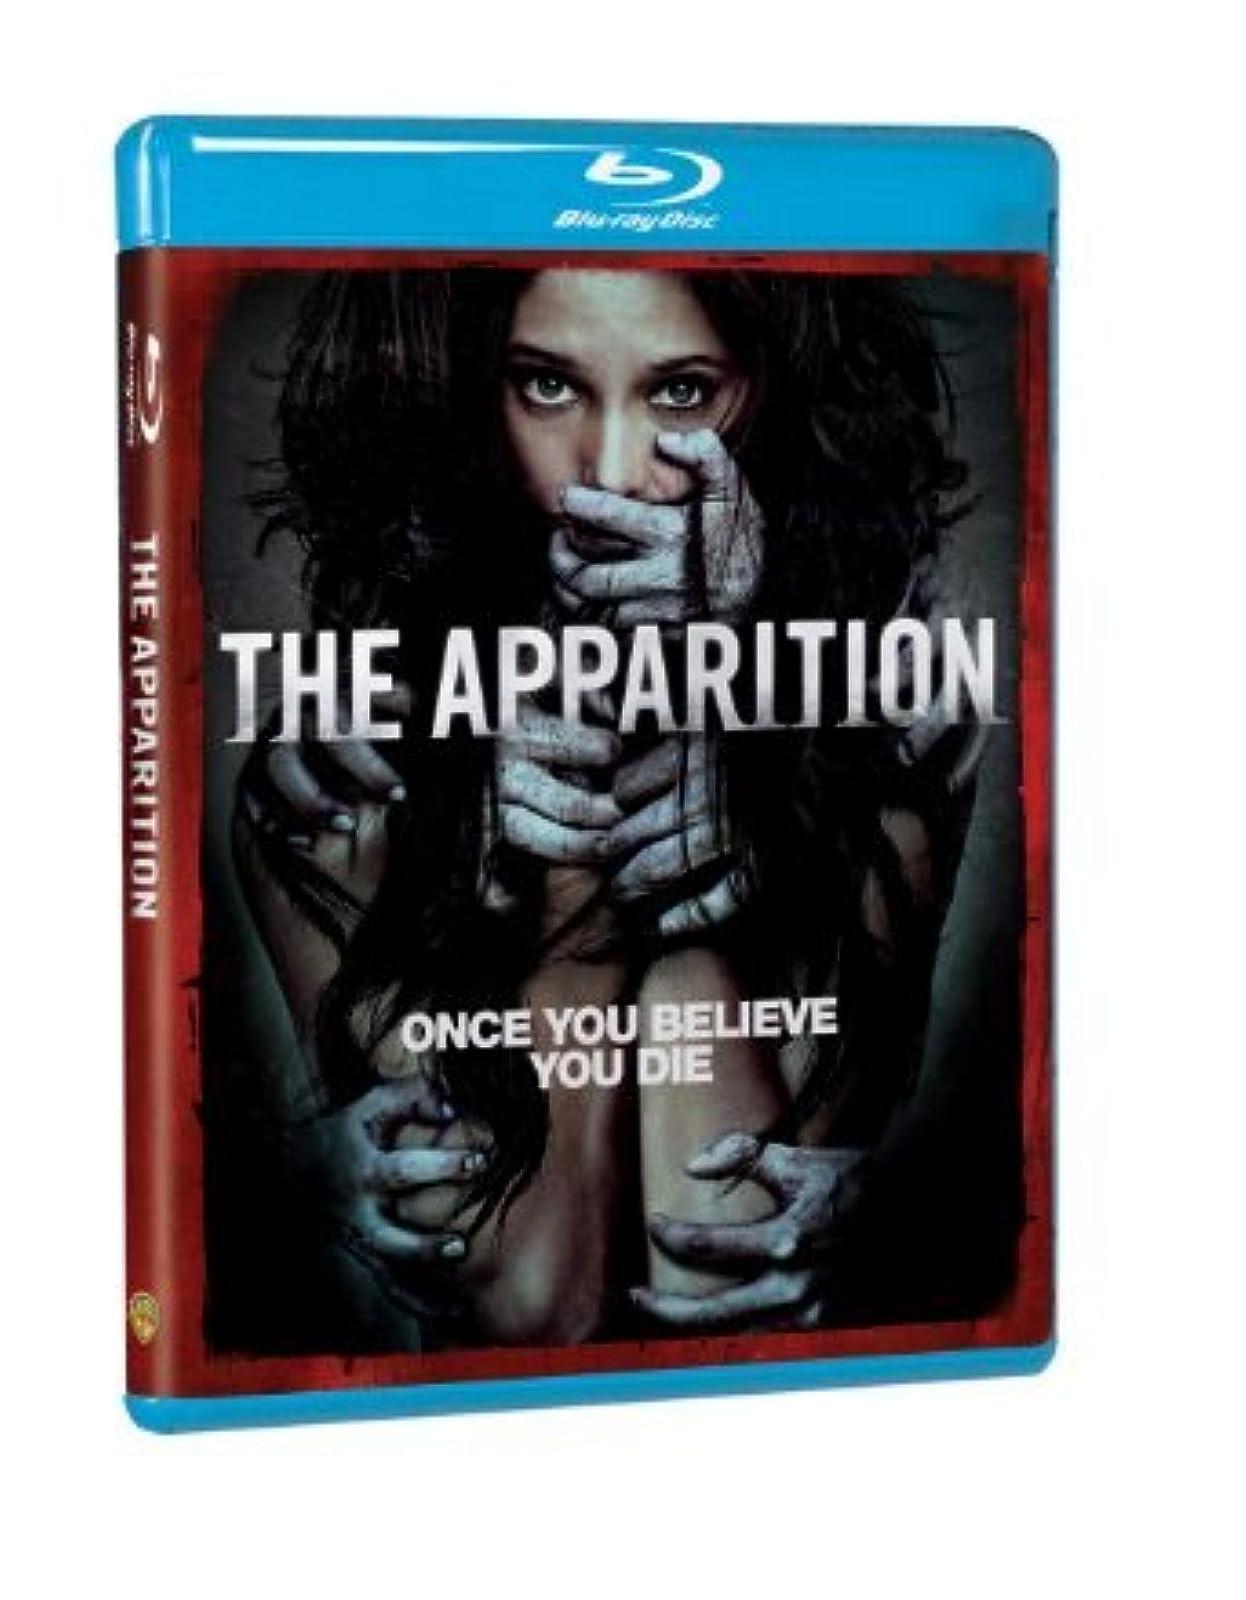 Apparition Blu-Ray On Blu-Ray